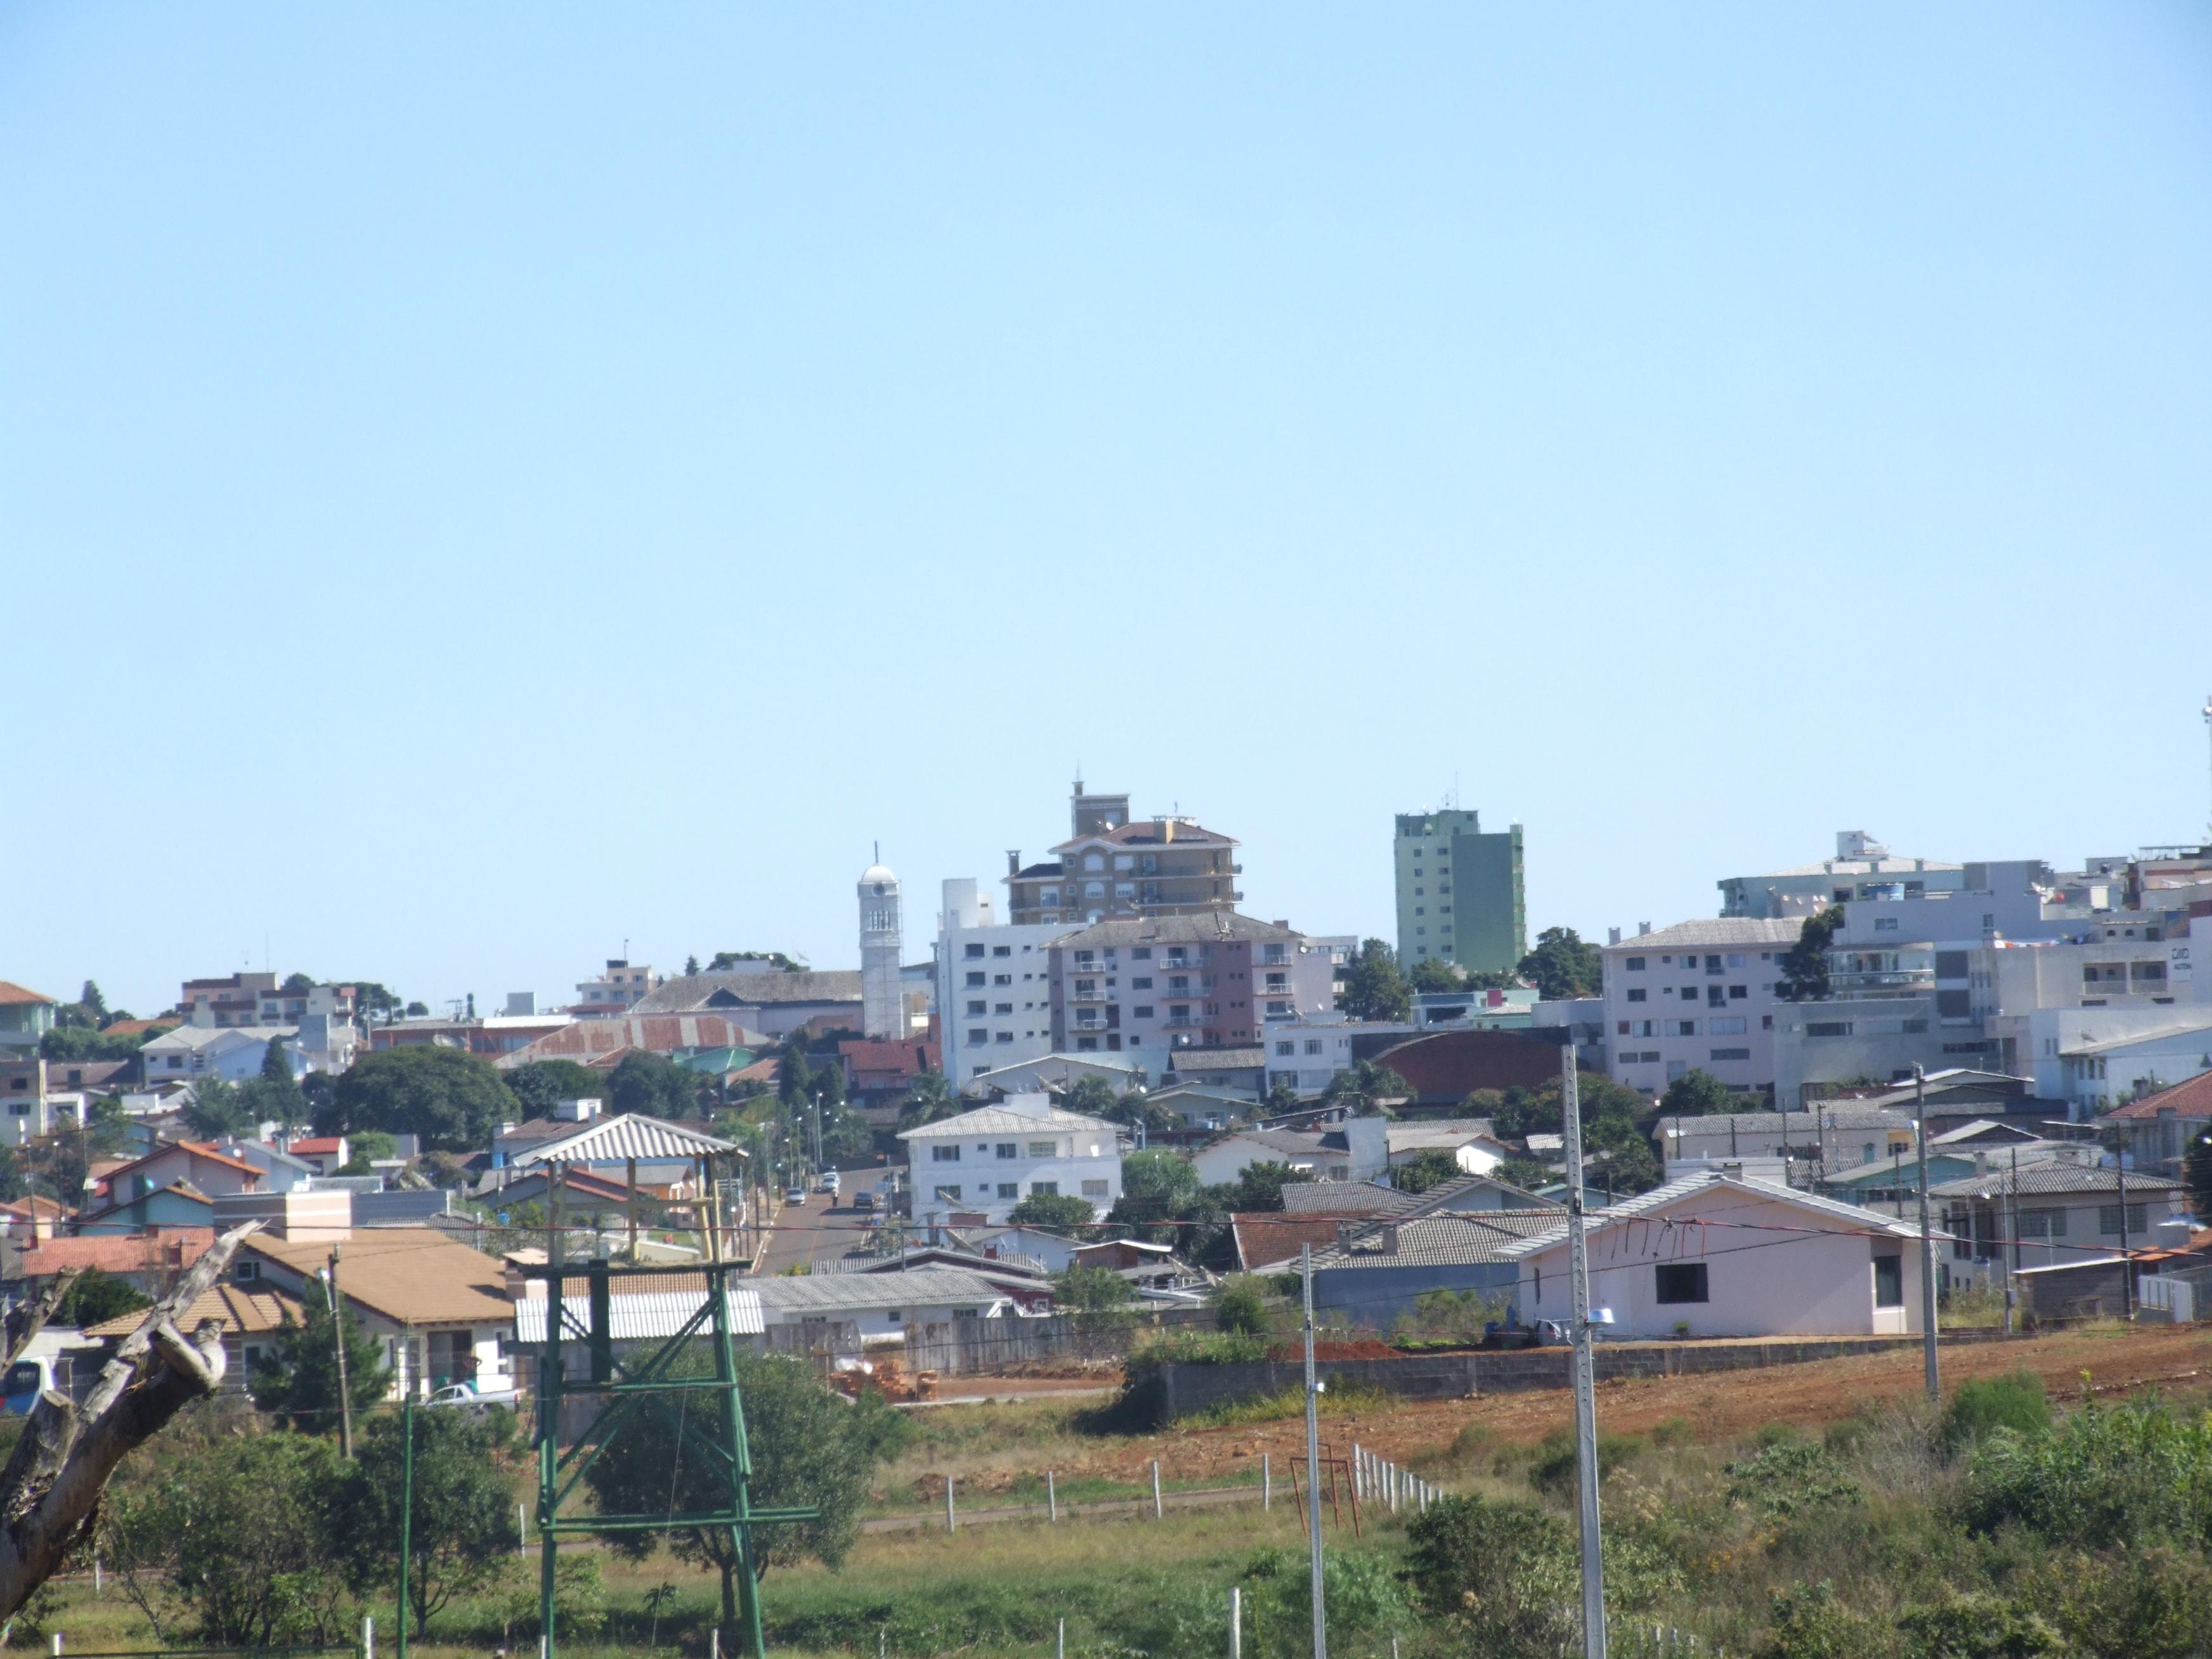 Campos Novos Santa Catarina fonte: upload.wikimedia.org